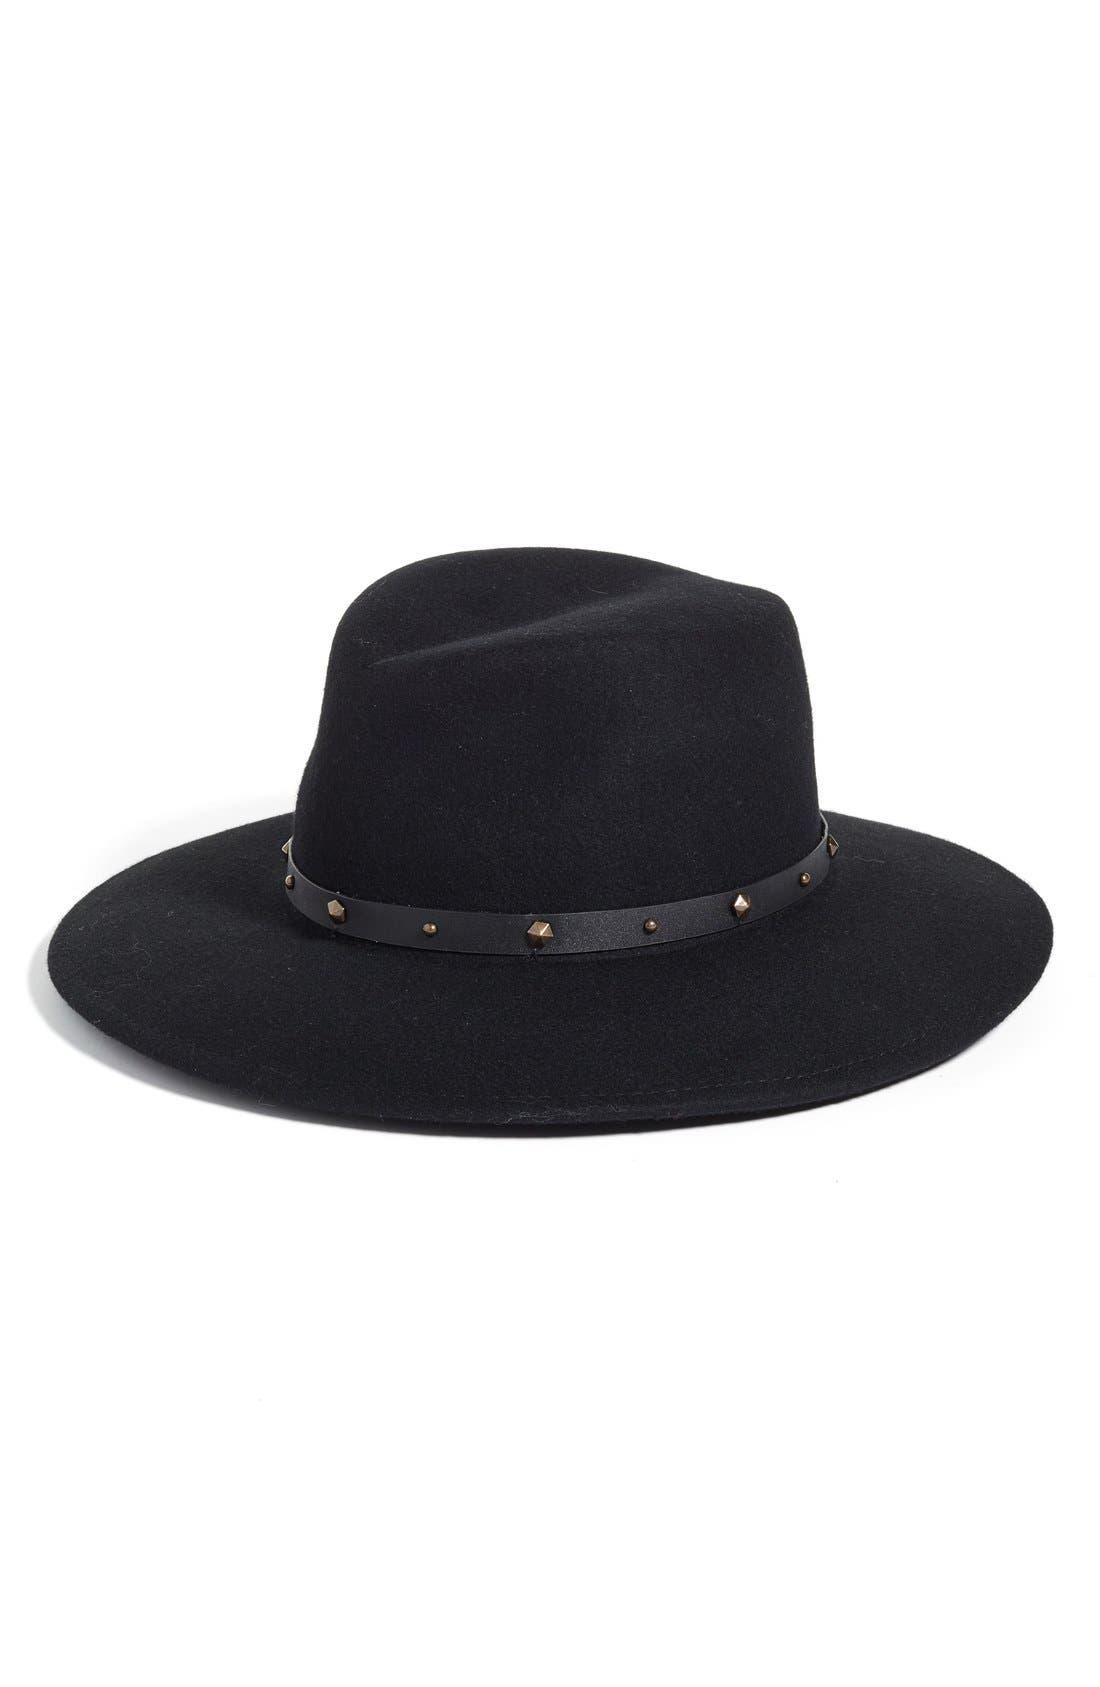 Alternate Image 1 Selected - Eric Javits Karli Wool Felt Wide Brim Hat